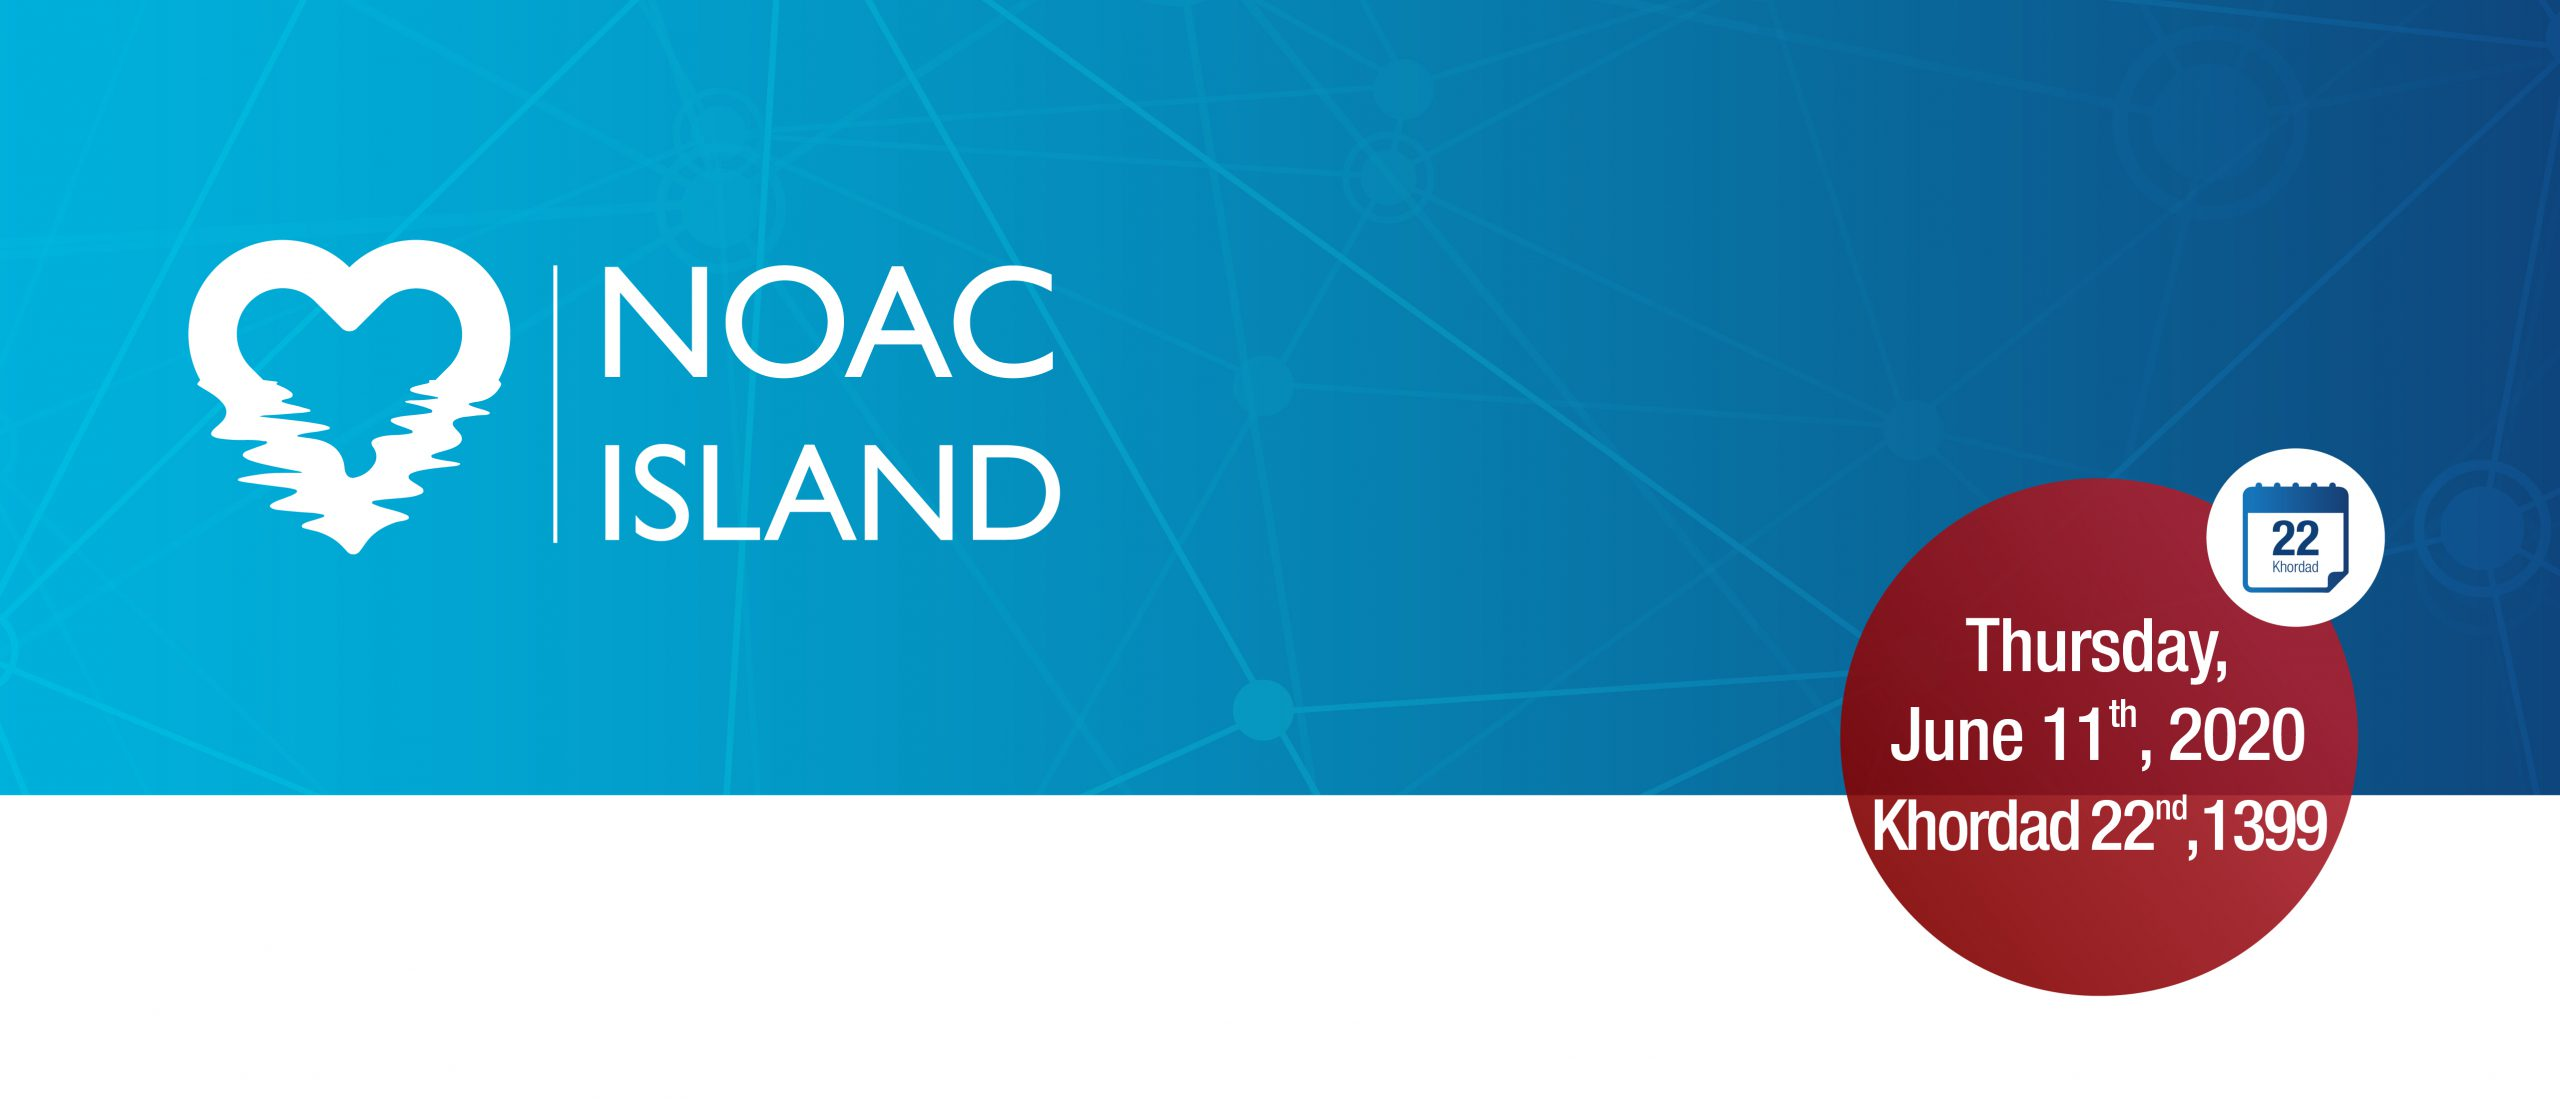 NOAC Island